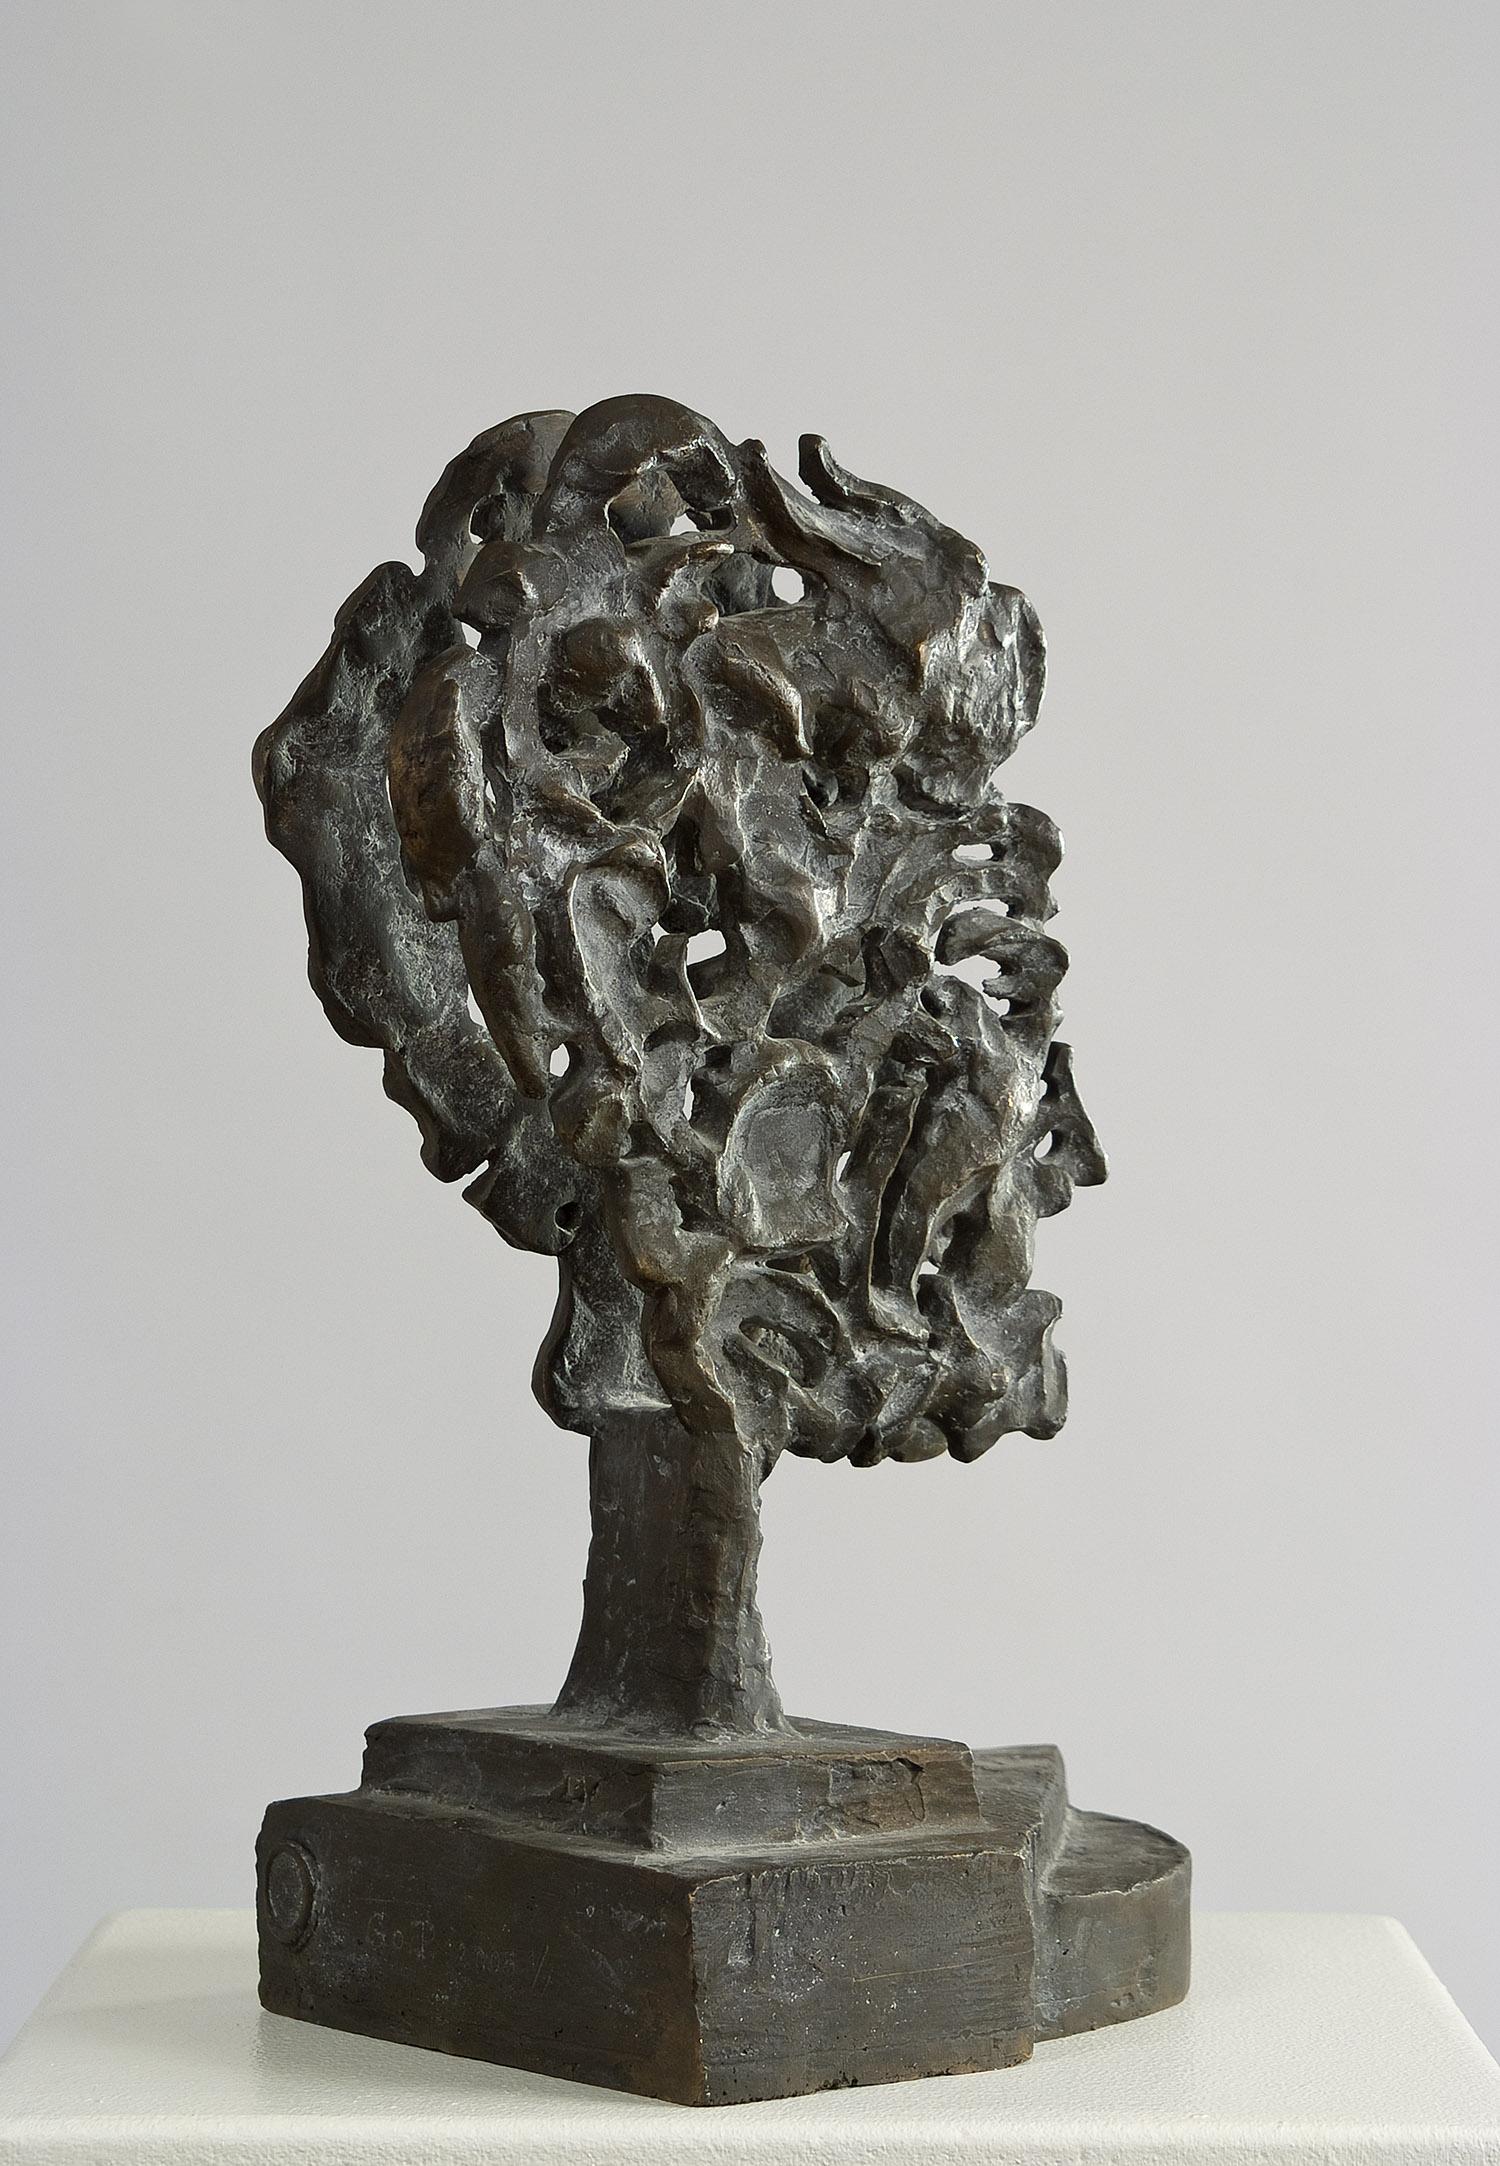 Schizo-Kopf | 2005 | Bronzeplastik | 33 x 15 x 22 cm